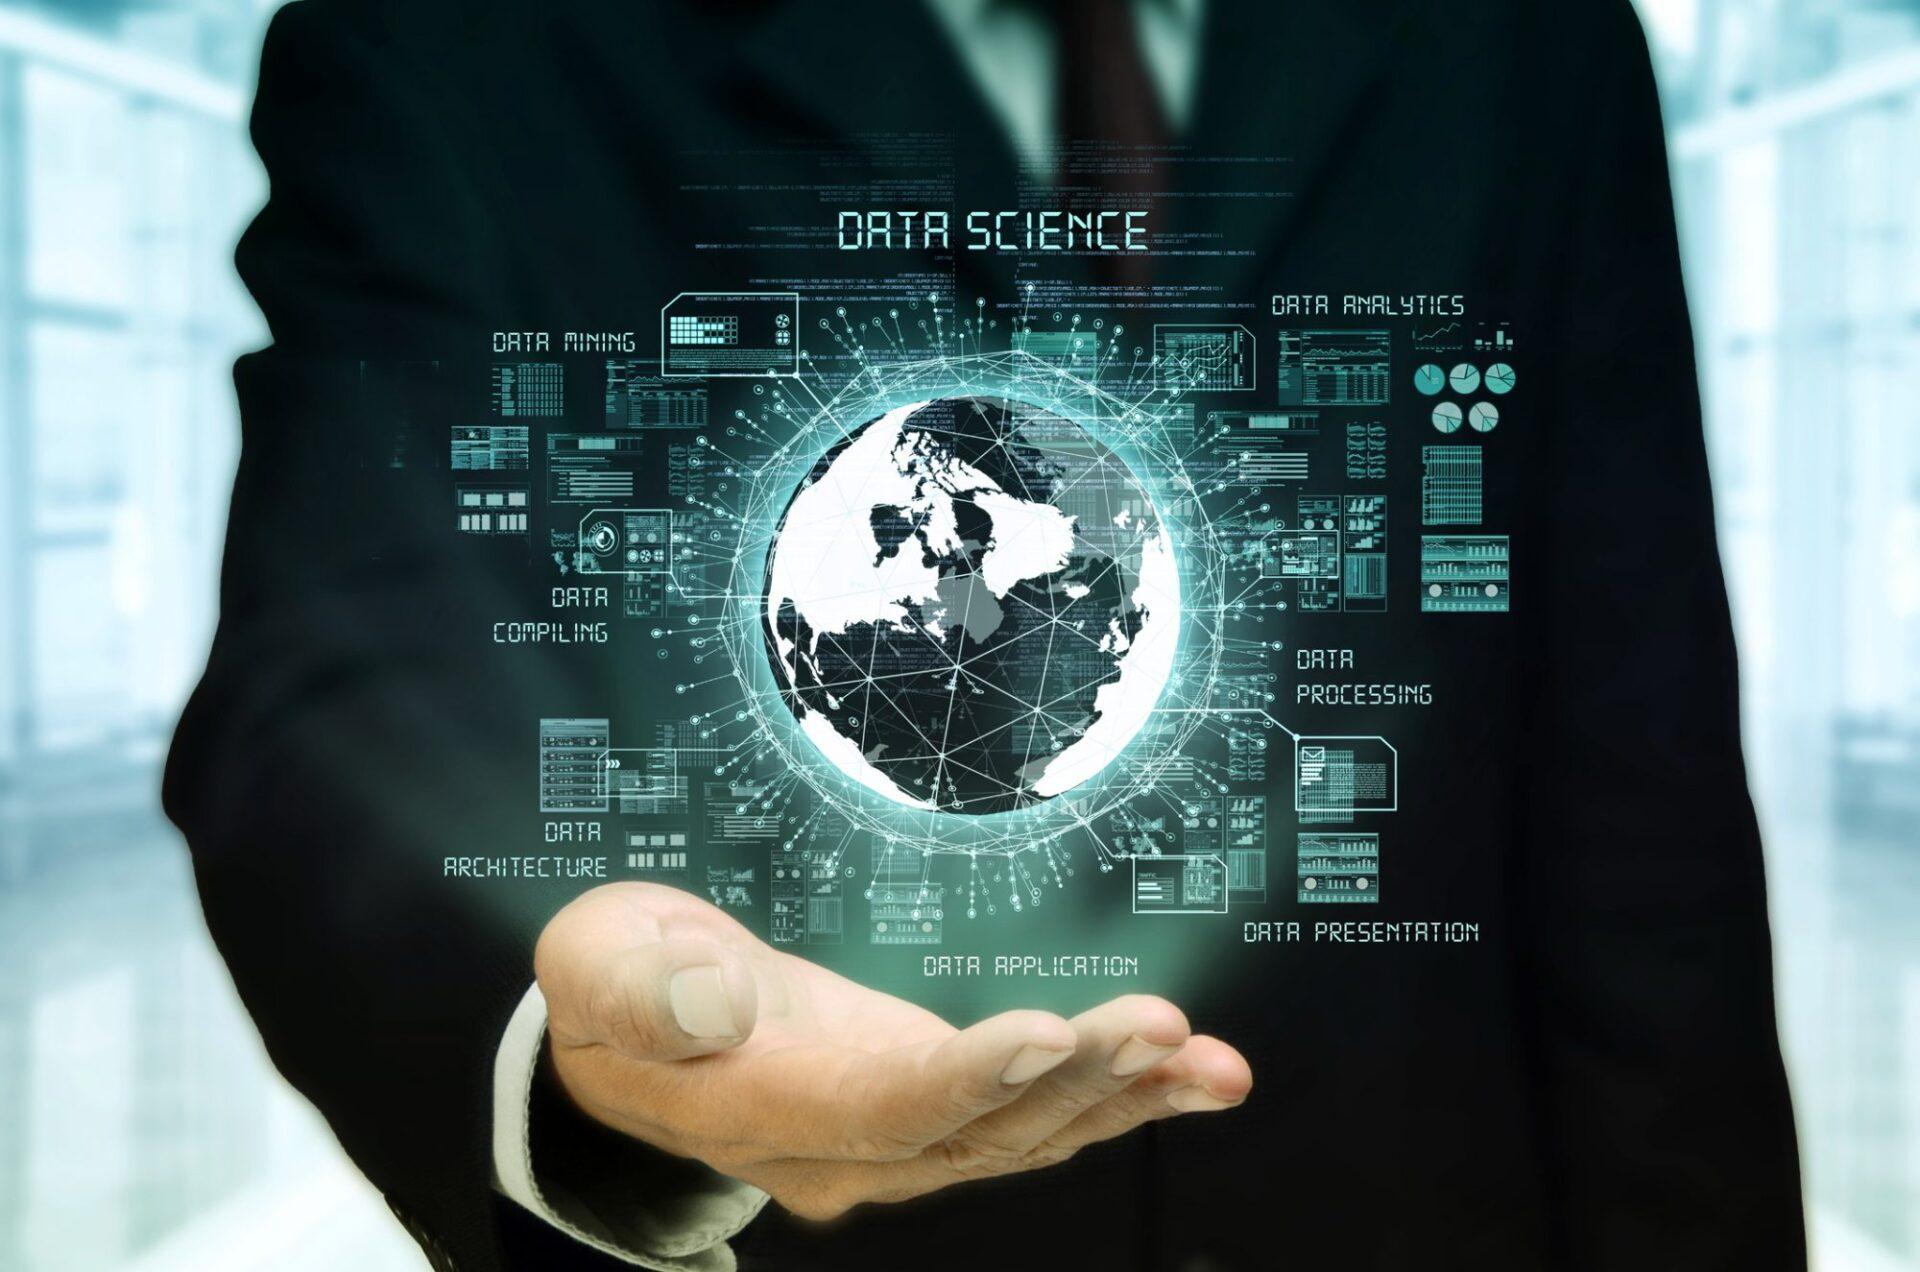 Mengenal Data Science, Ilmu Terpenting dalam Penerapan Teknologi Big Data